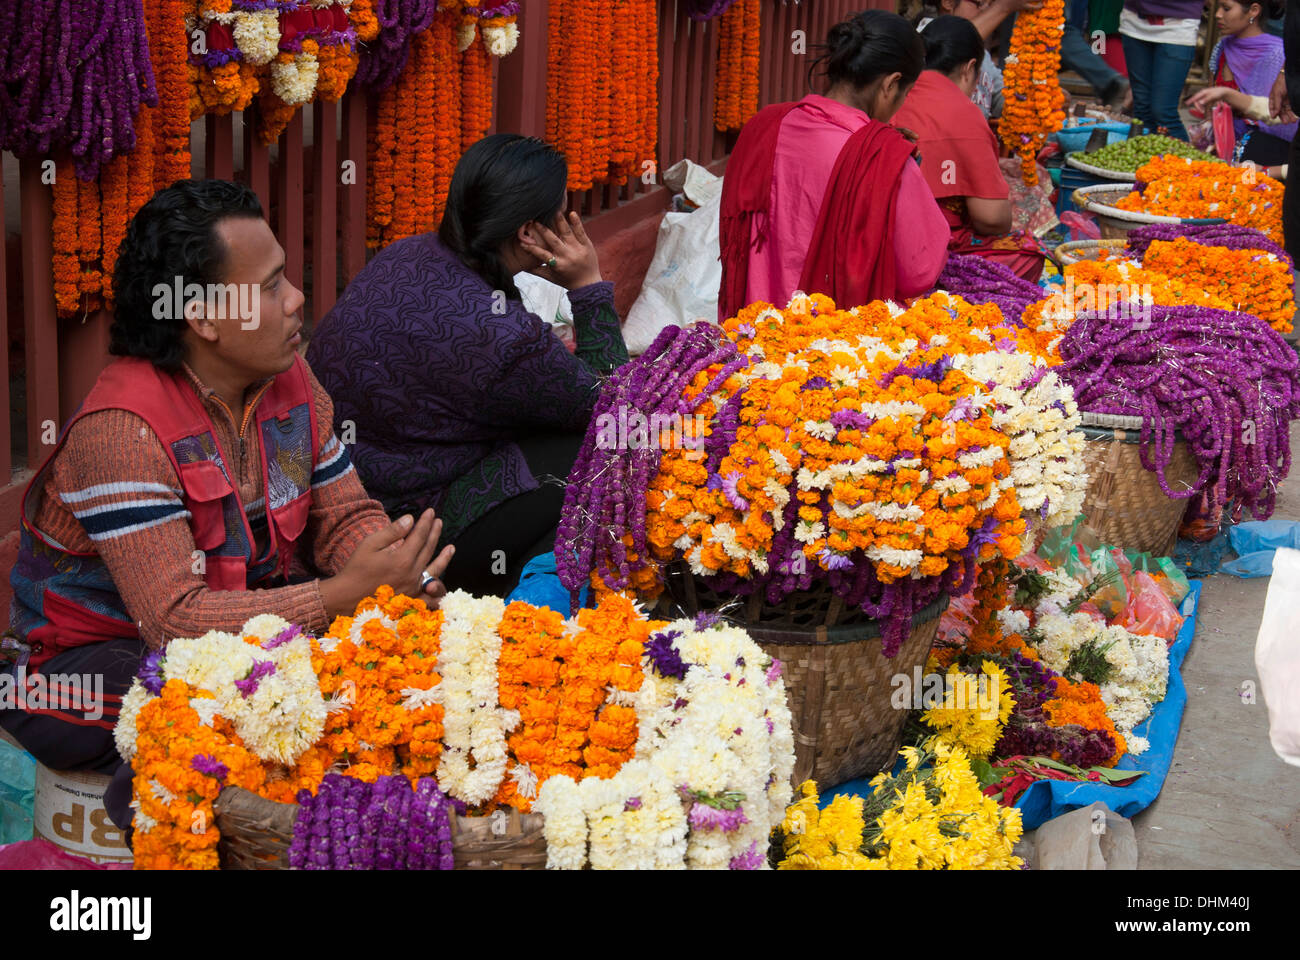 Selling garland in Kathmandu. - Stock Image